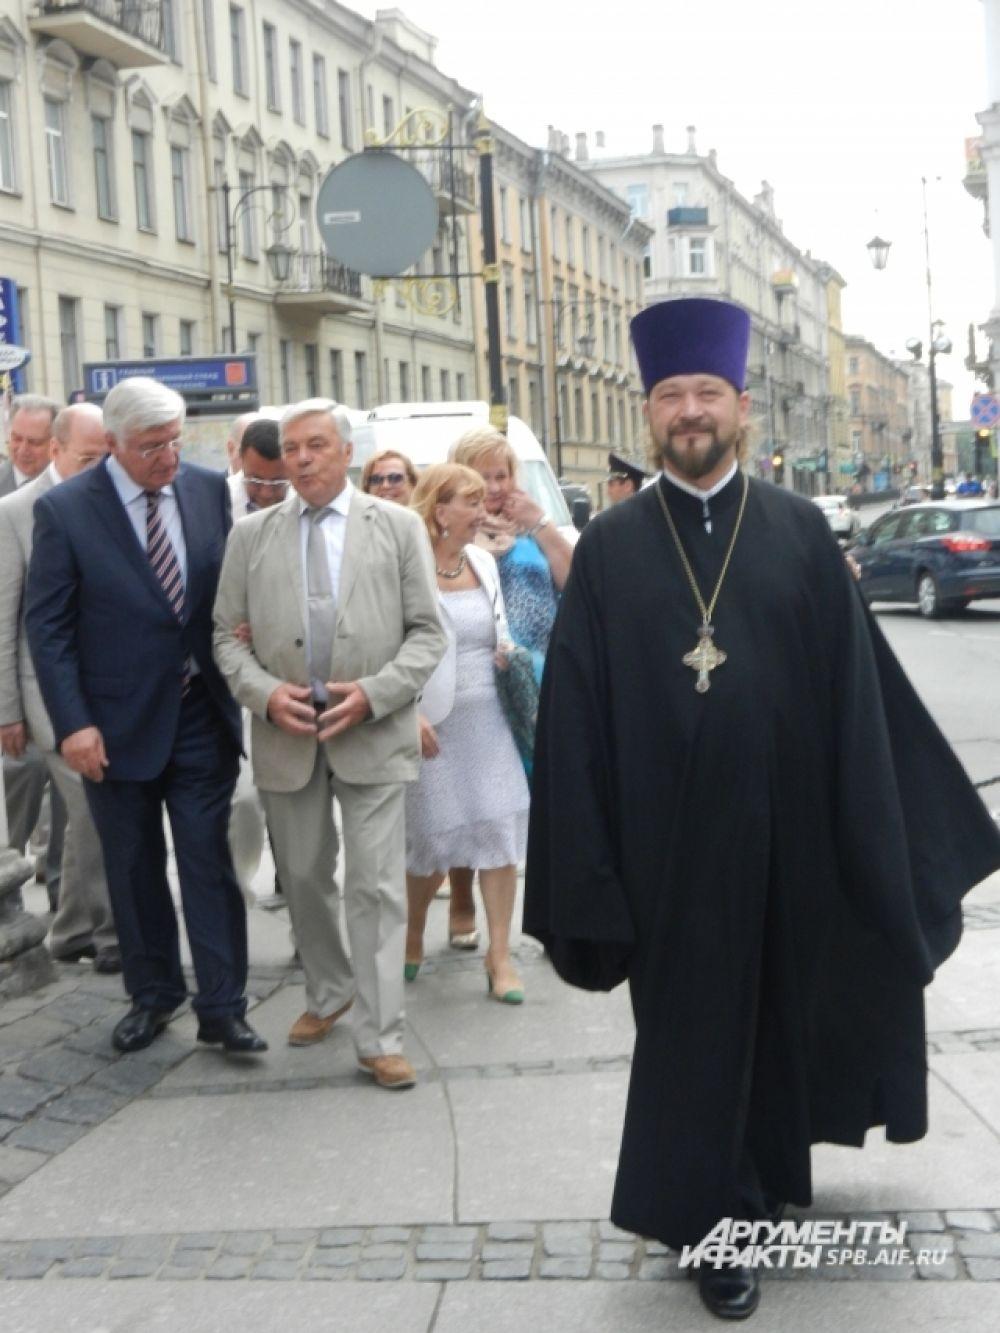 Протоиерей Александр Румянцев: «В храме рады всем!»